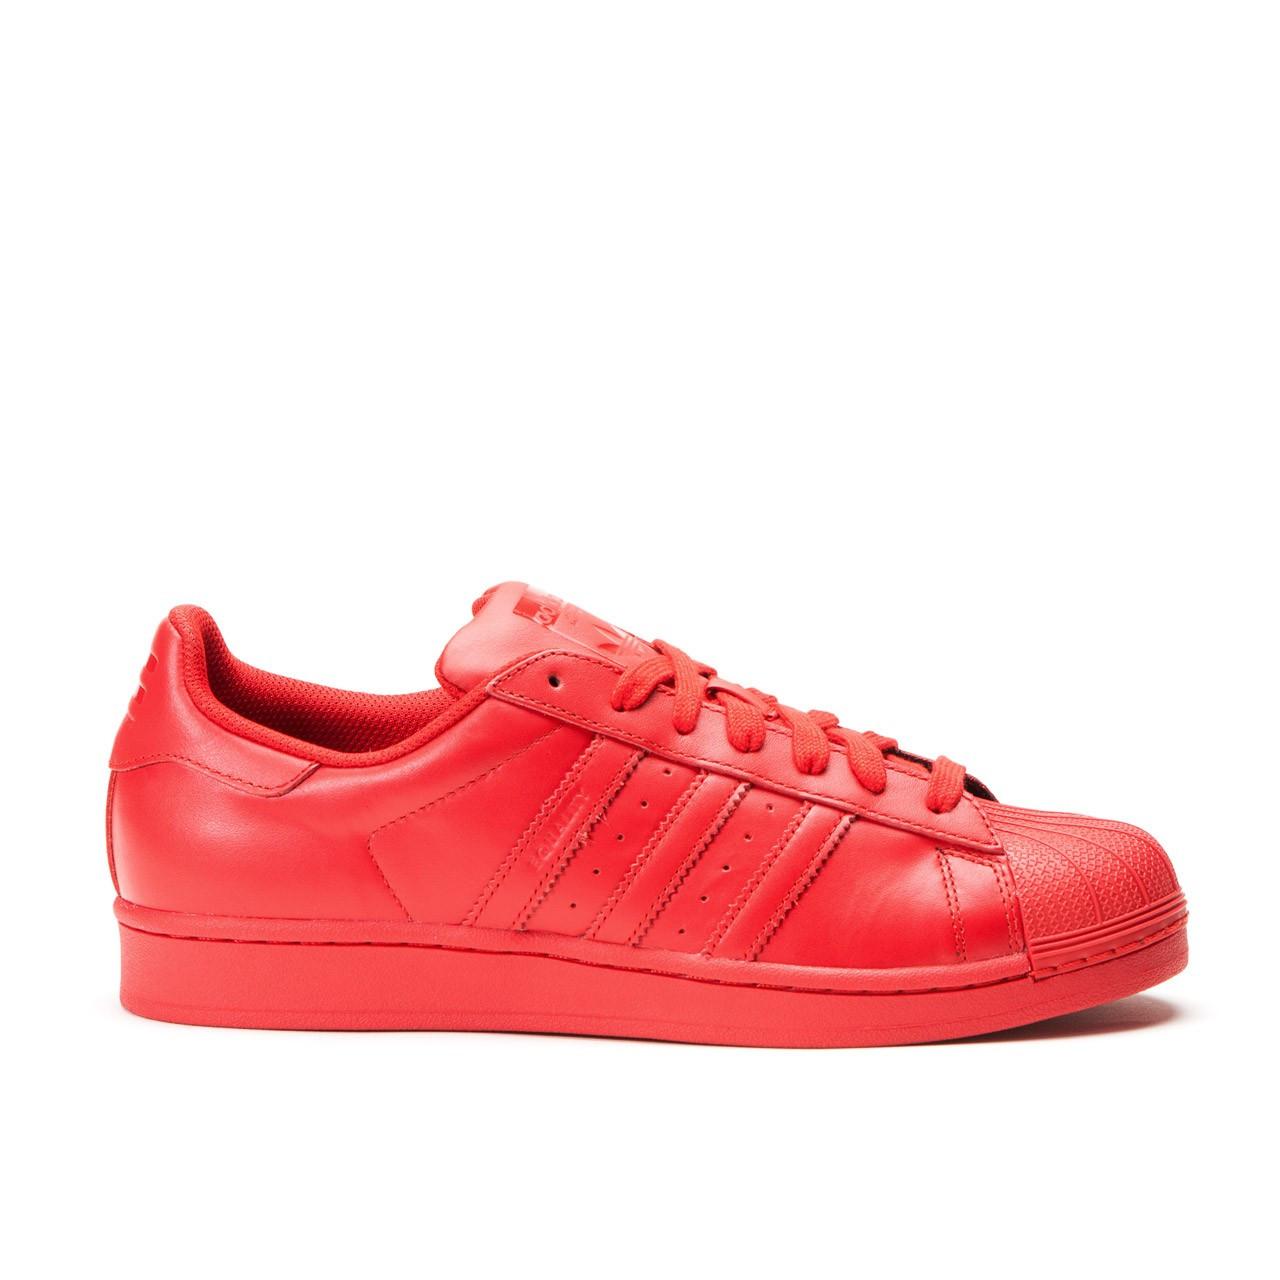 Женские кроссовки Adidas x Pharrell Superstar Red